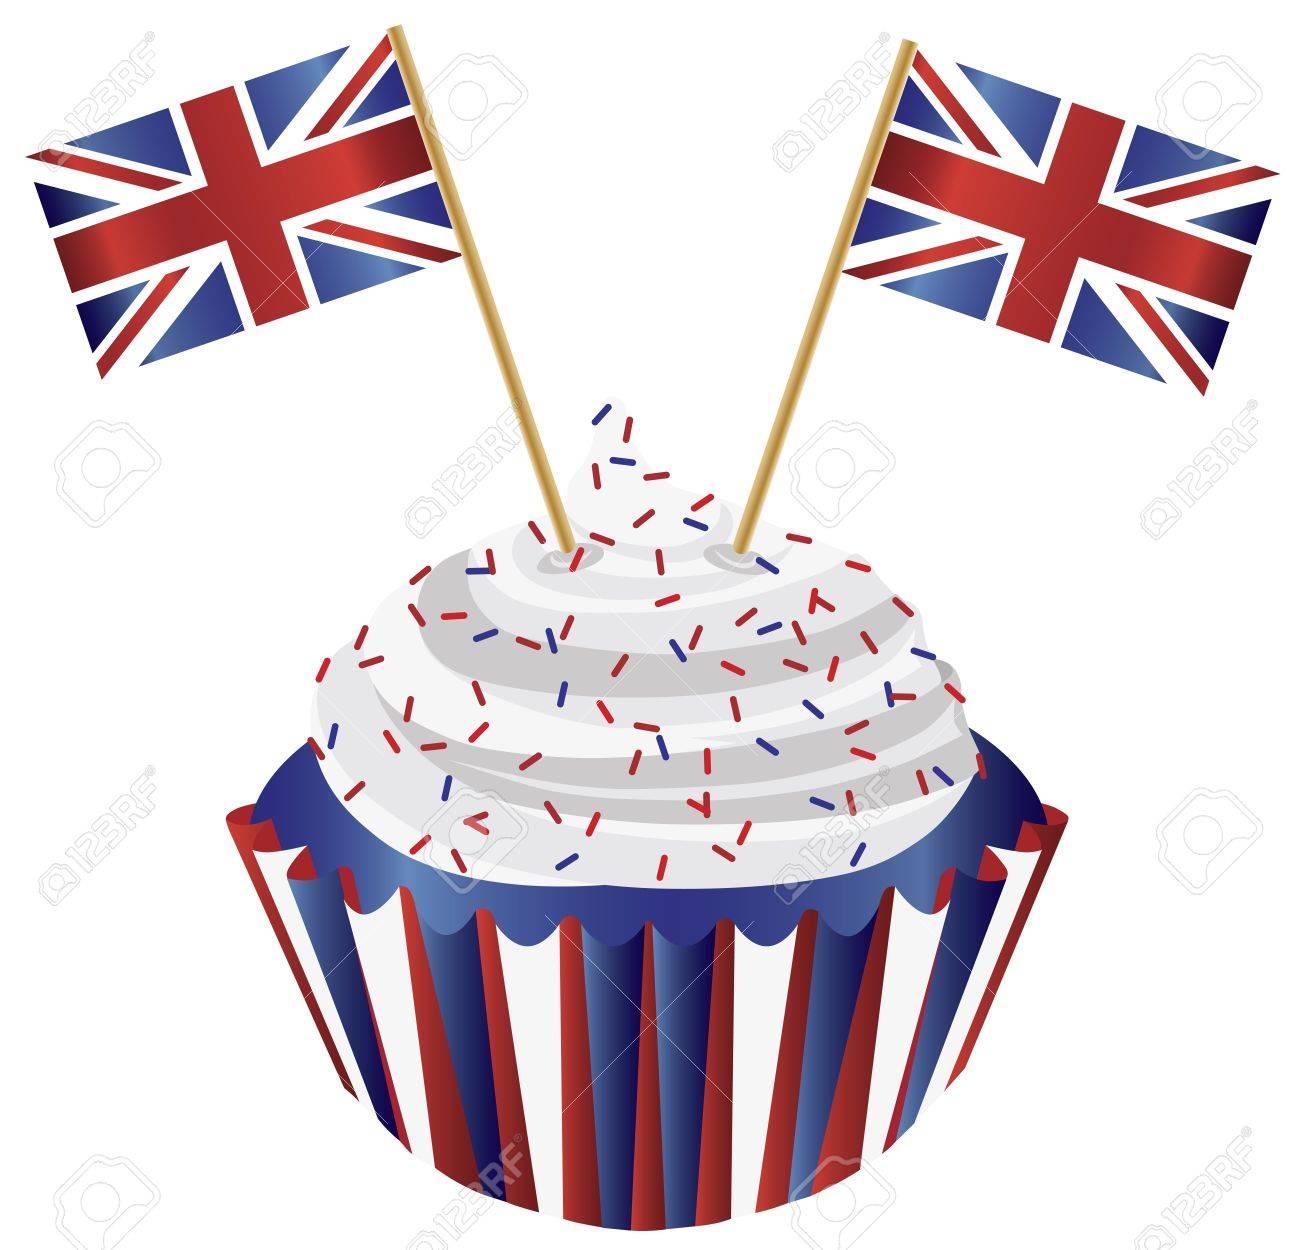 United Kingdom England Cupcake with Jack Union Flags Illustration Stock Vector - 15035864